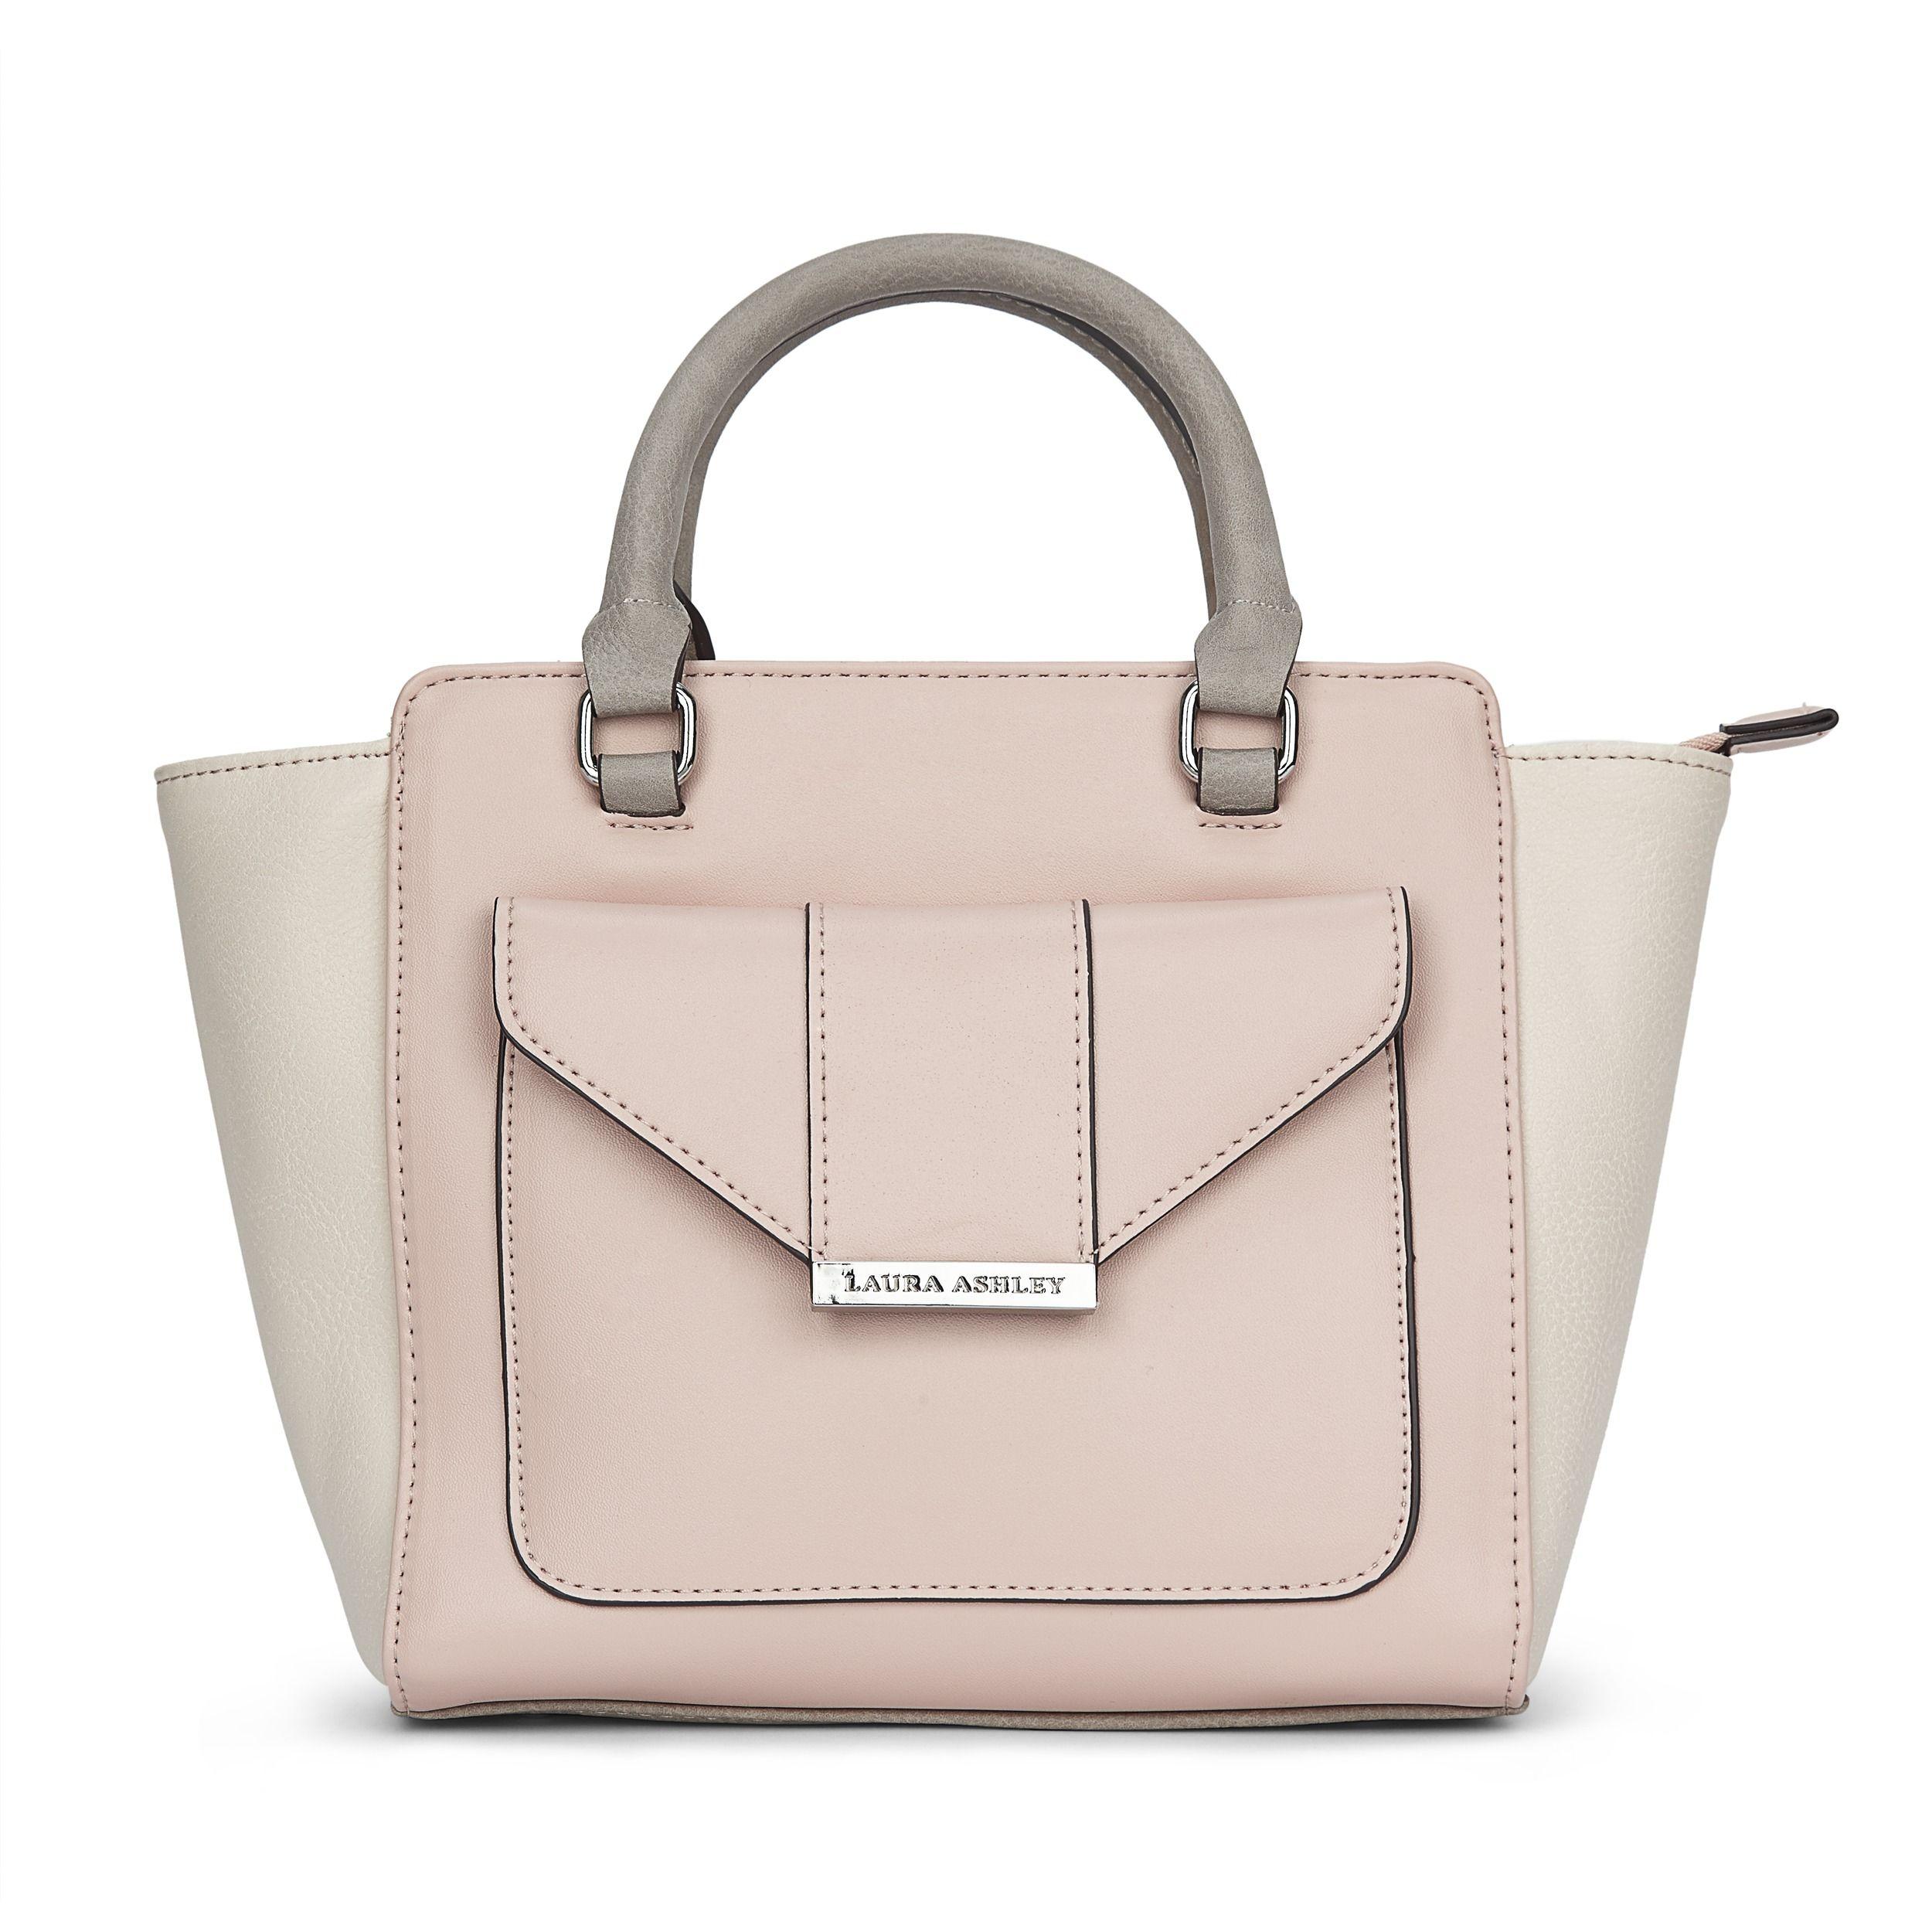 Colour Block Envelope Mini Tote Bag at Laura Ashley  lauraashley  handbag   accessories  pastel 622c0a24c169c